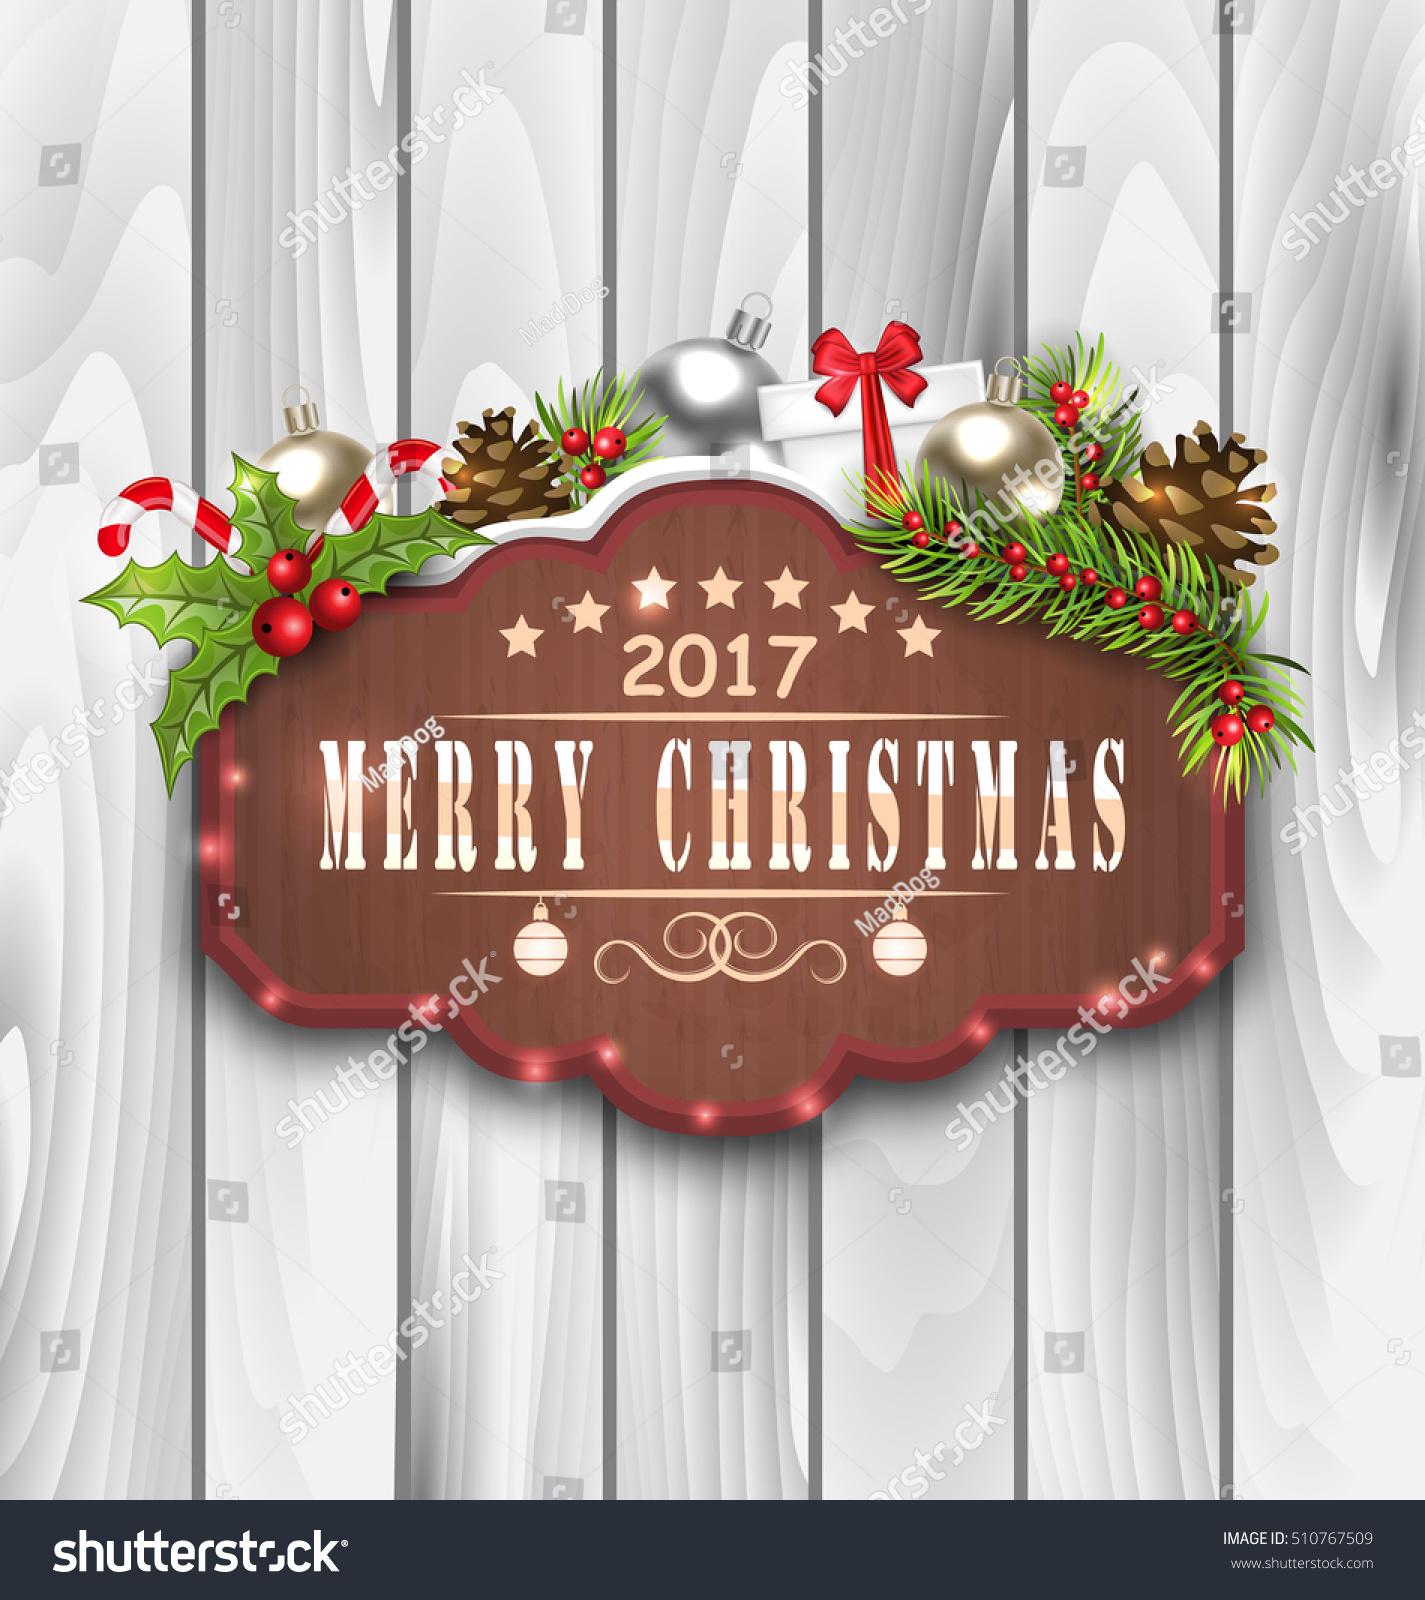 illustration wooden placard christmas decoration fir stock vector 510767509 shutterstock. Black Bedroom Furniture Sets. Home Design Ideas